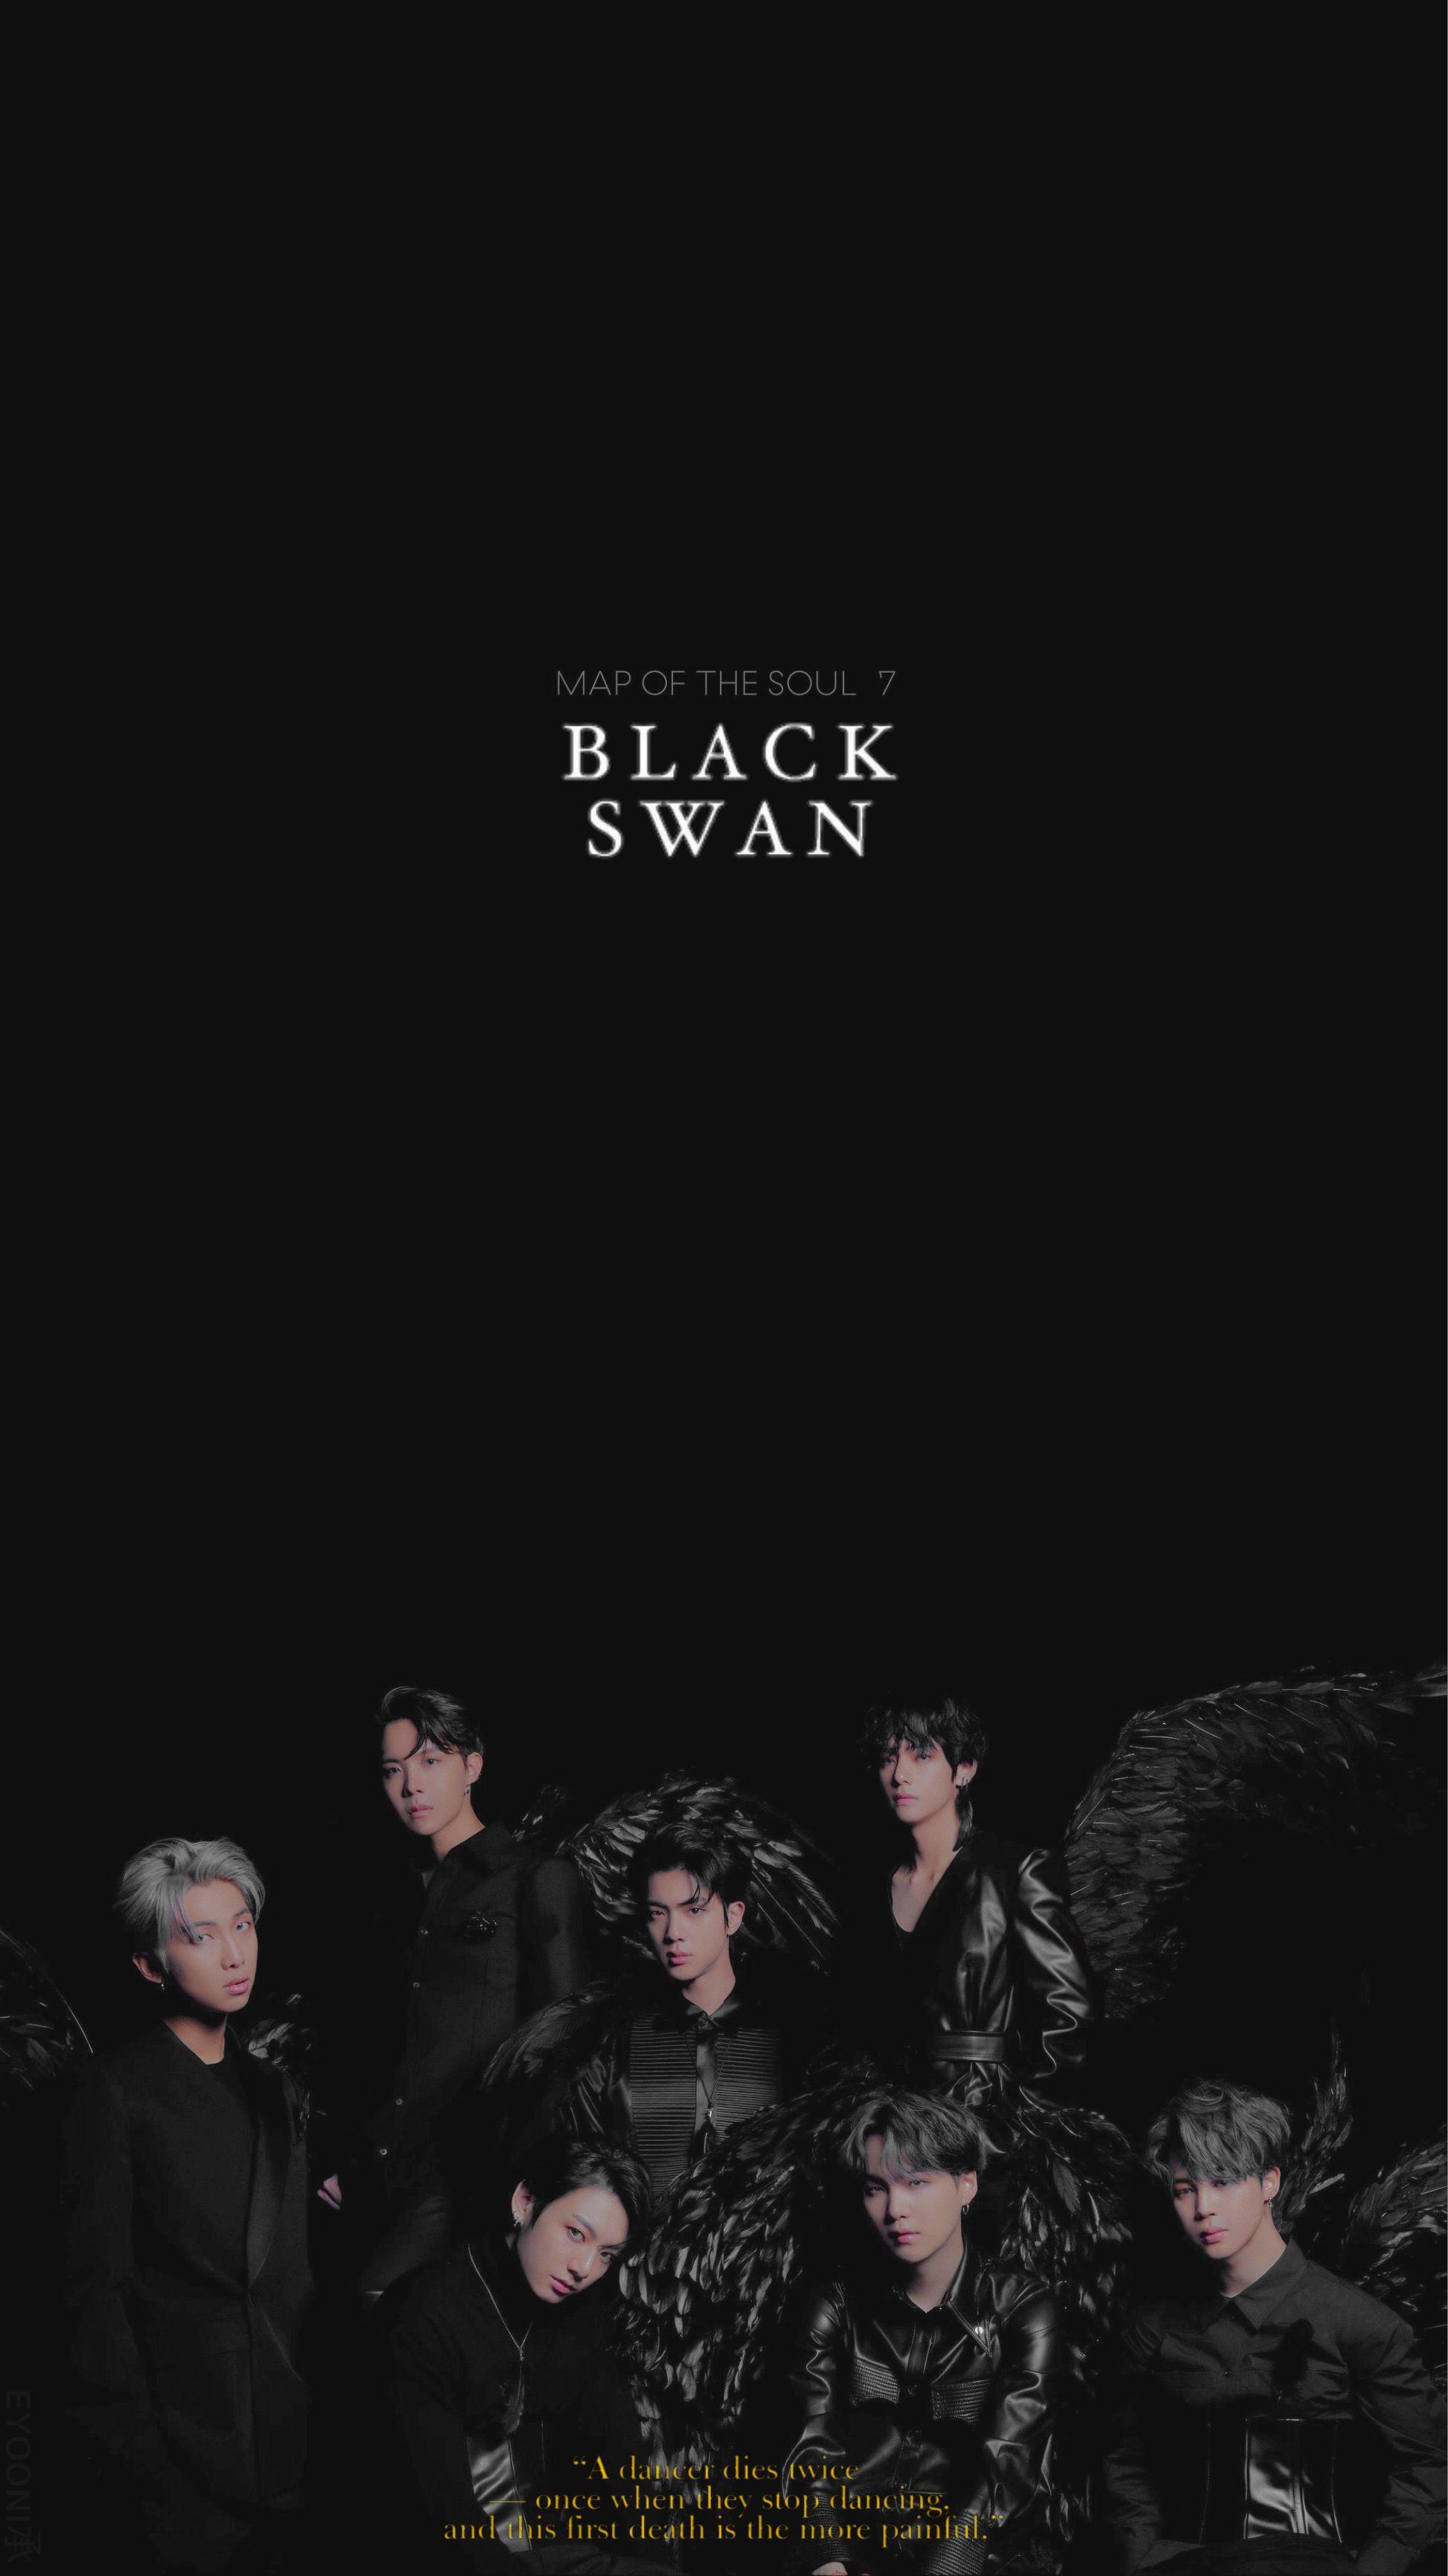 Black Swan Wallpaper Bts Komik Seyler Komik Bts black swan wallpaper download